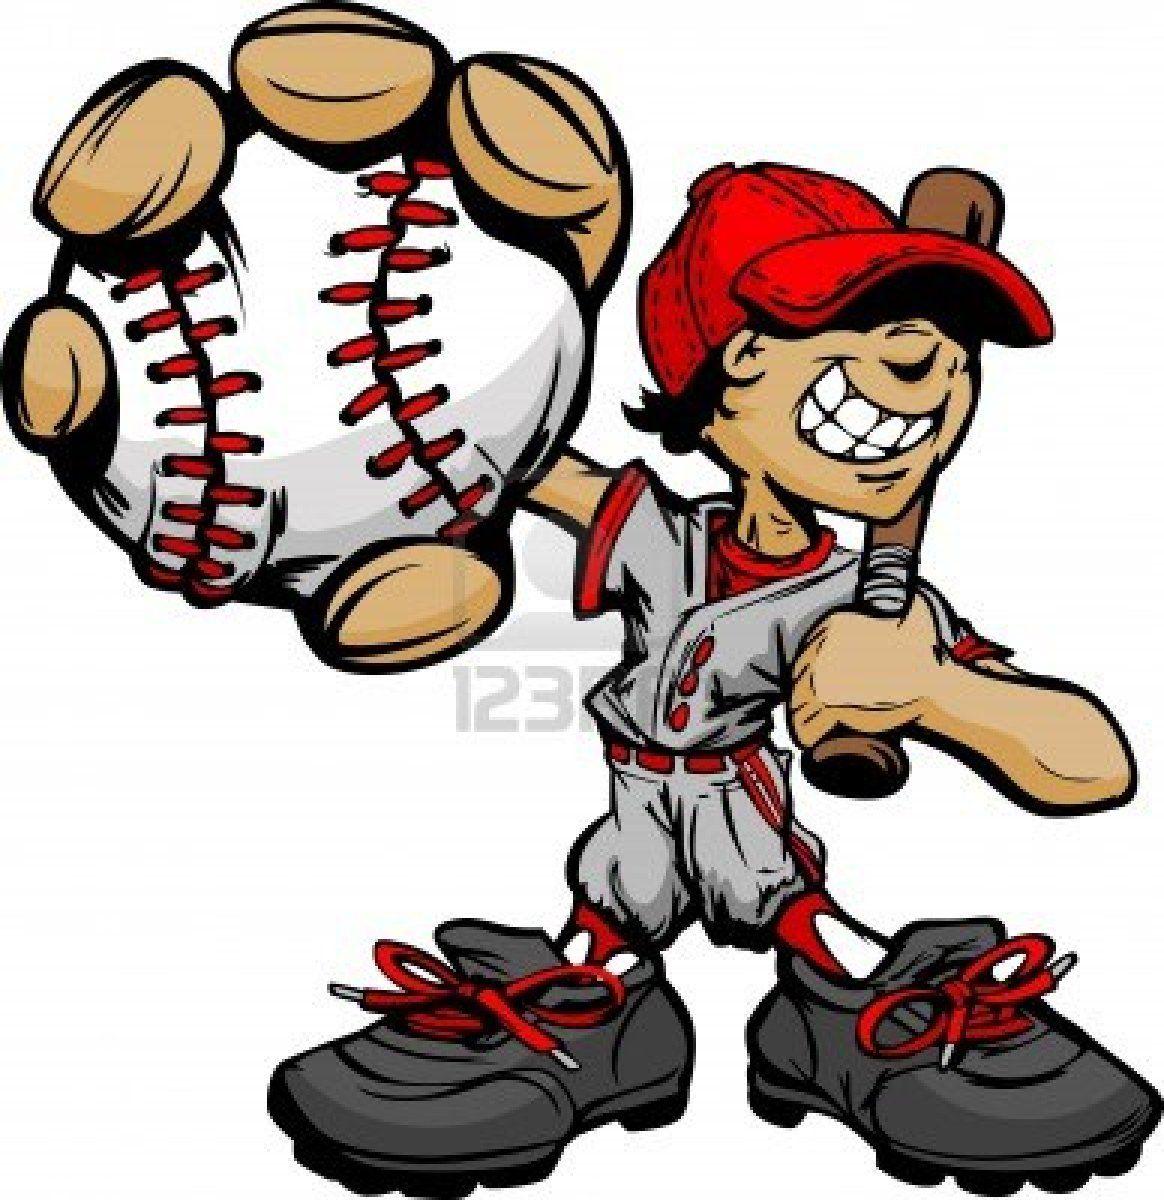 baseball boy cartoon player with bat and ball illustration stock rh pinterest com Baseball Laces Vector Baseball Glove Vector